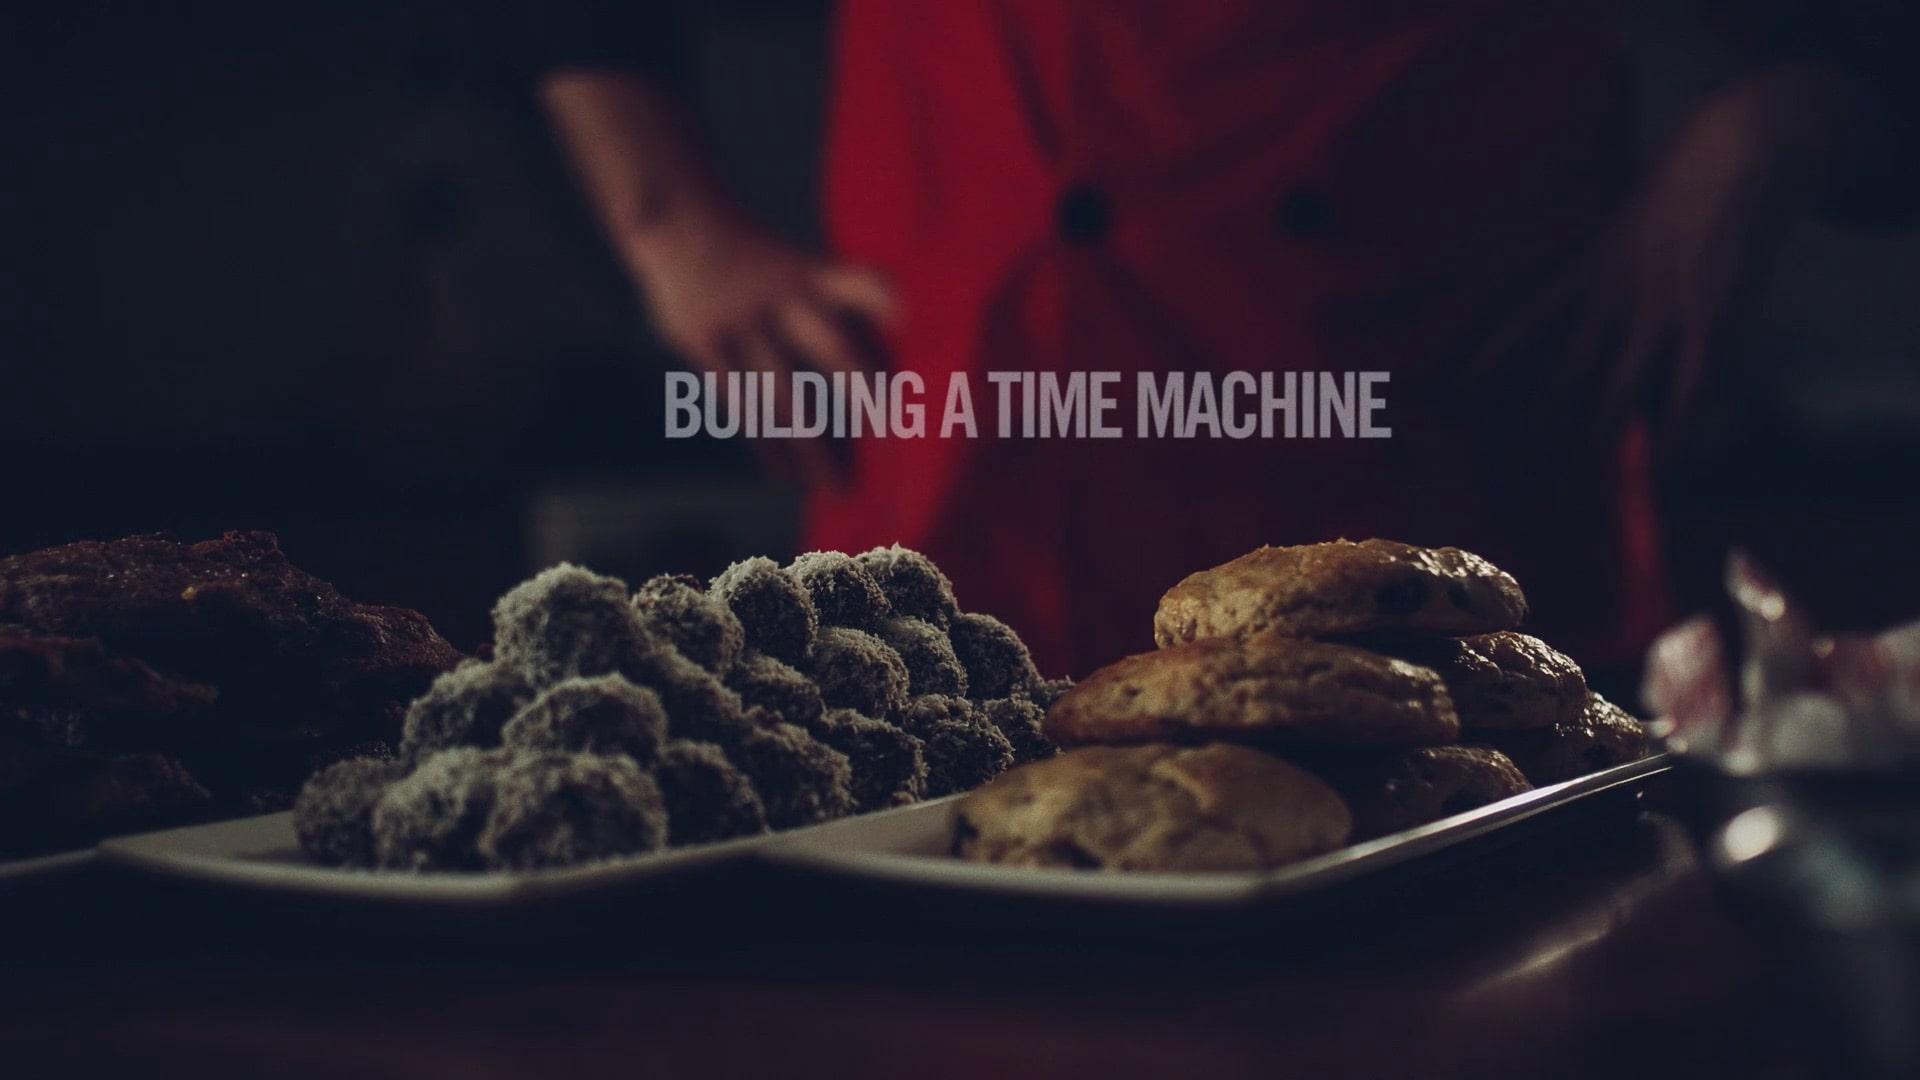 Building a time machine